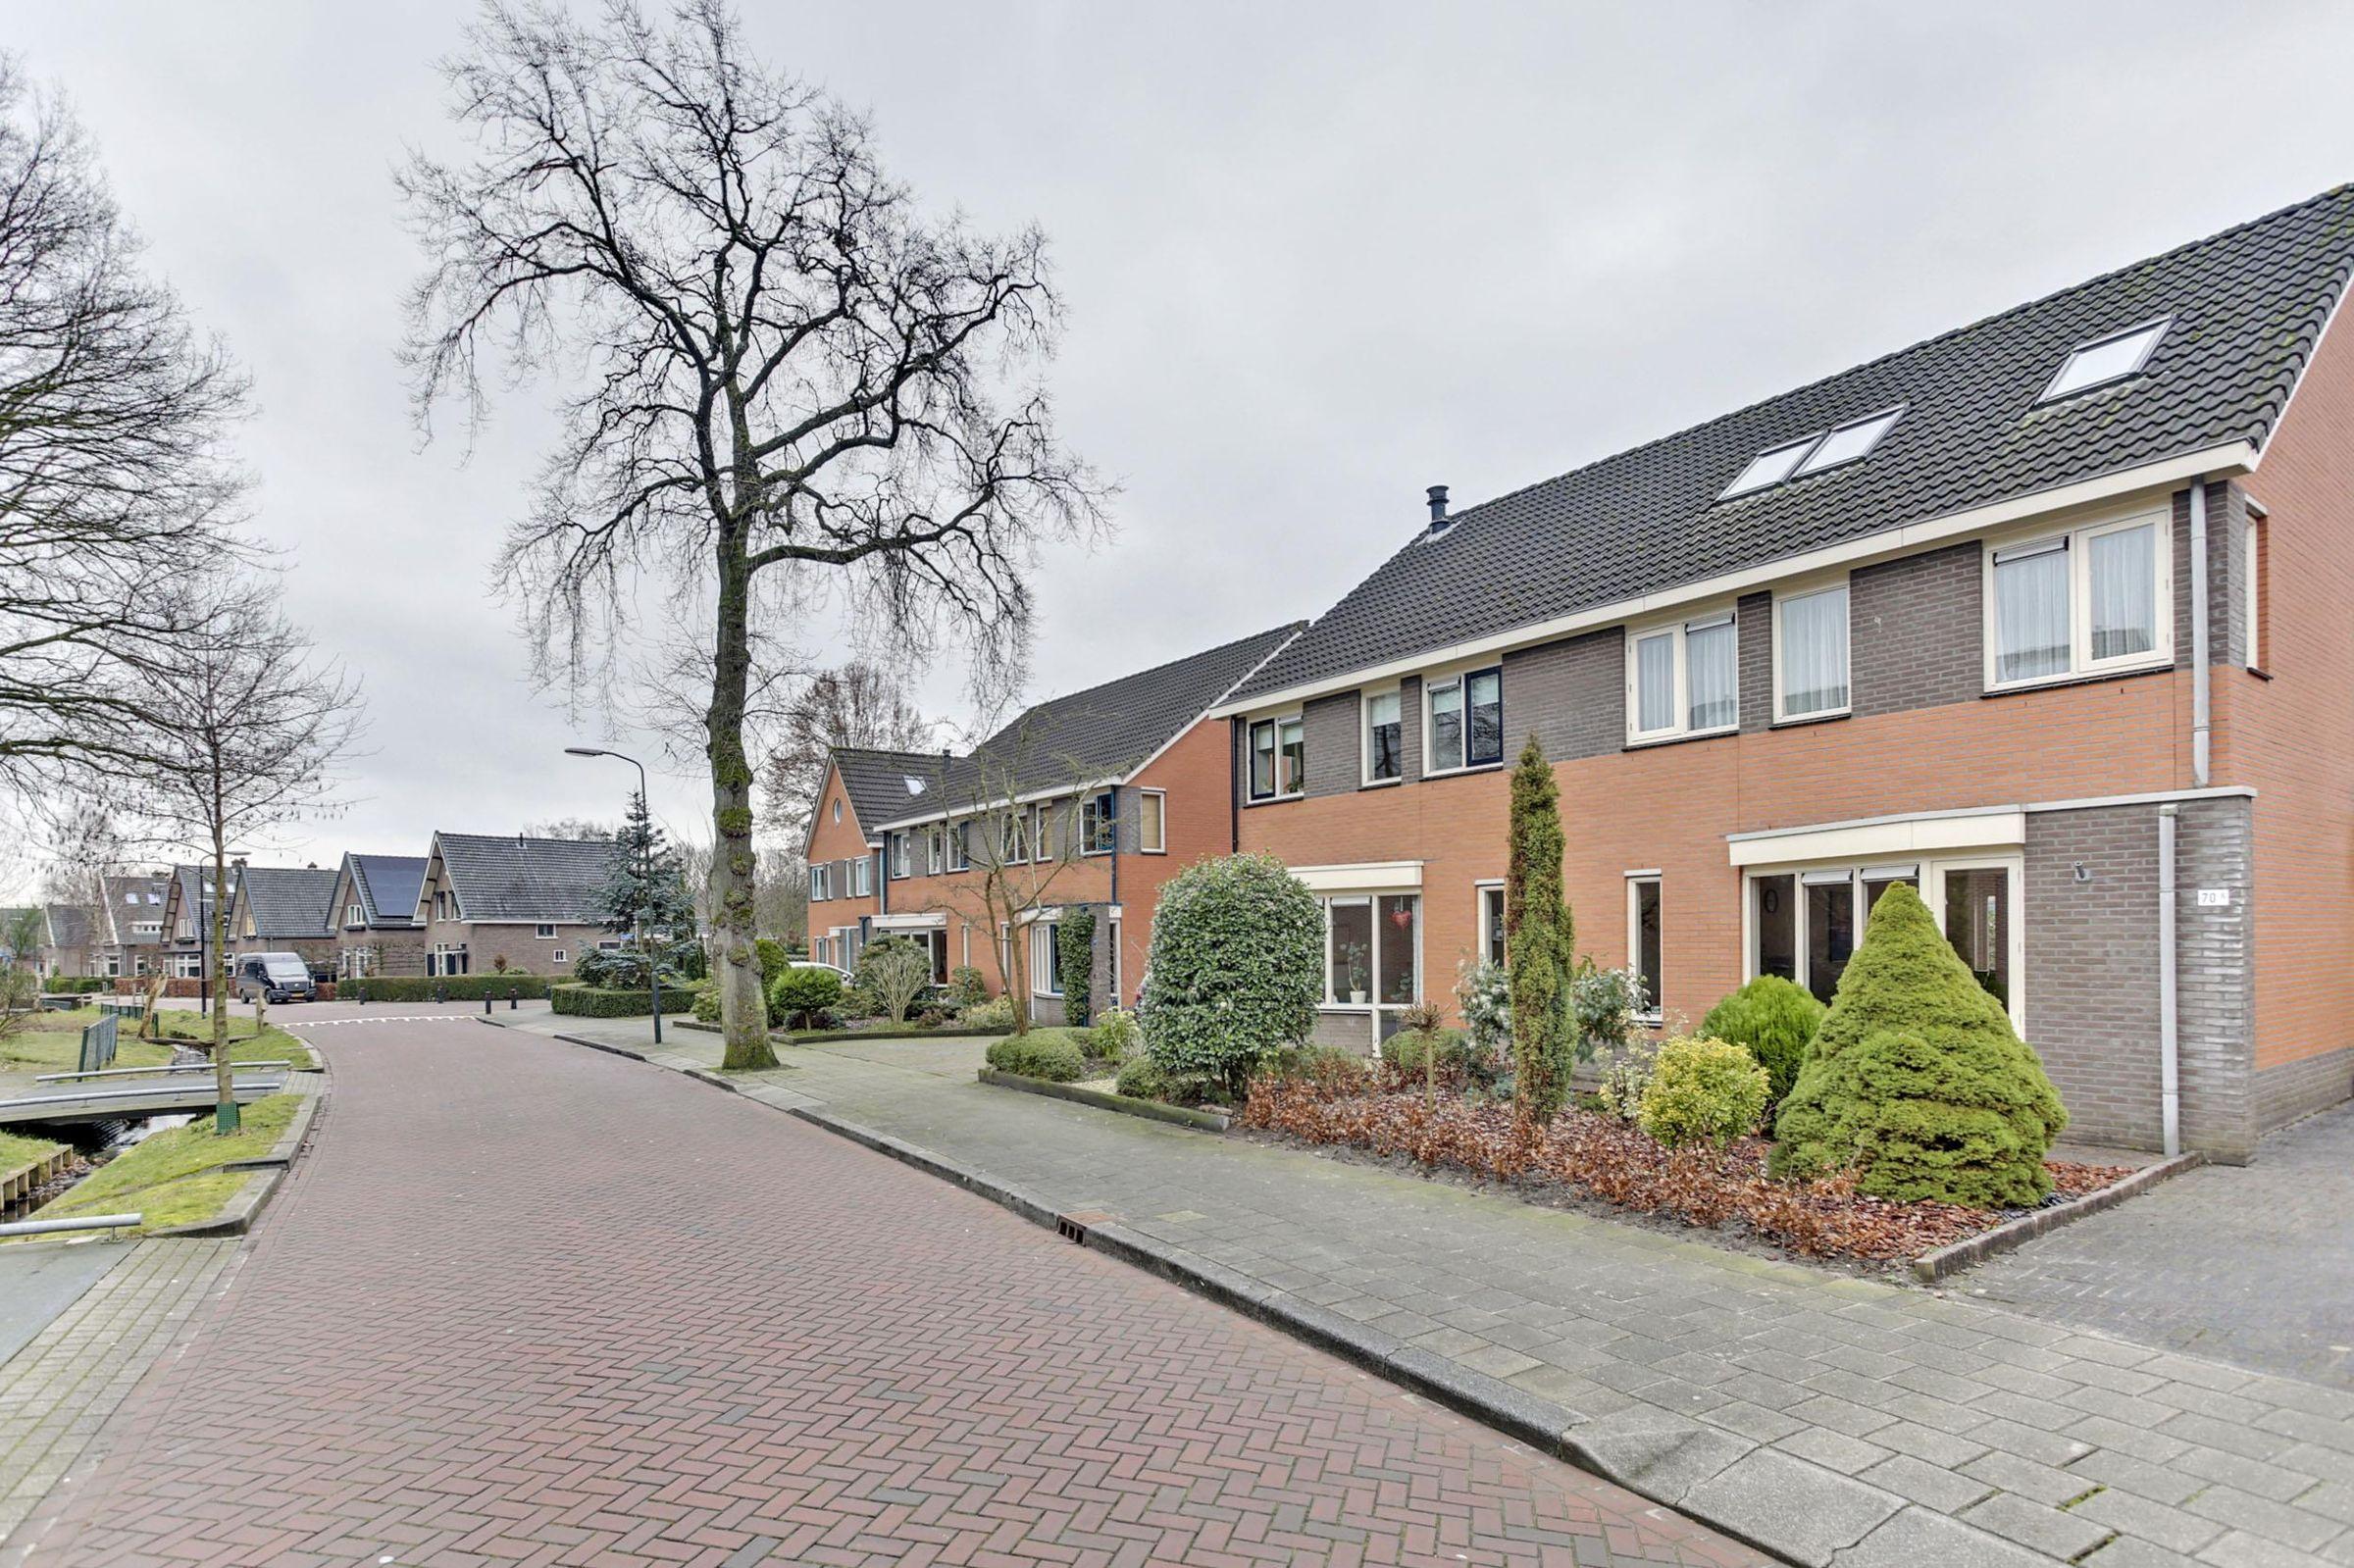 Zanderijweg 70, Apeldoorn